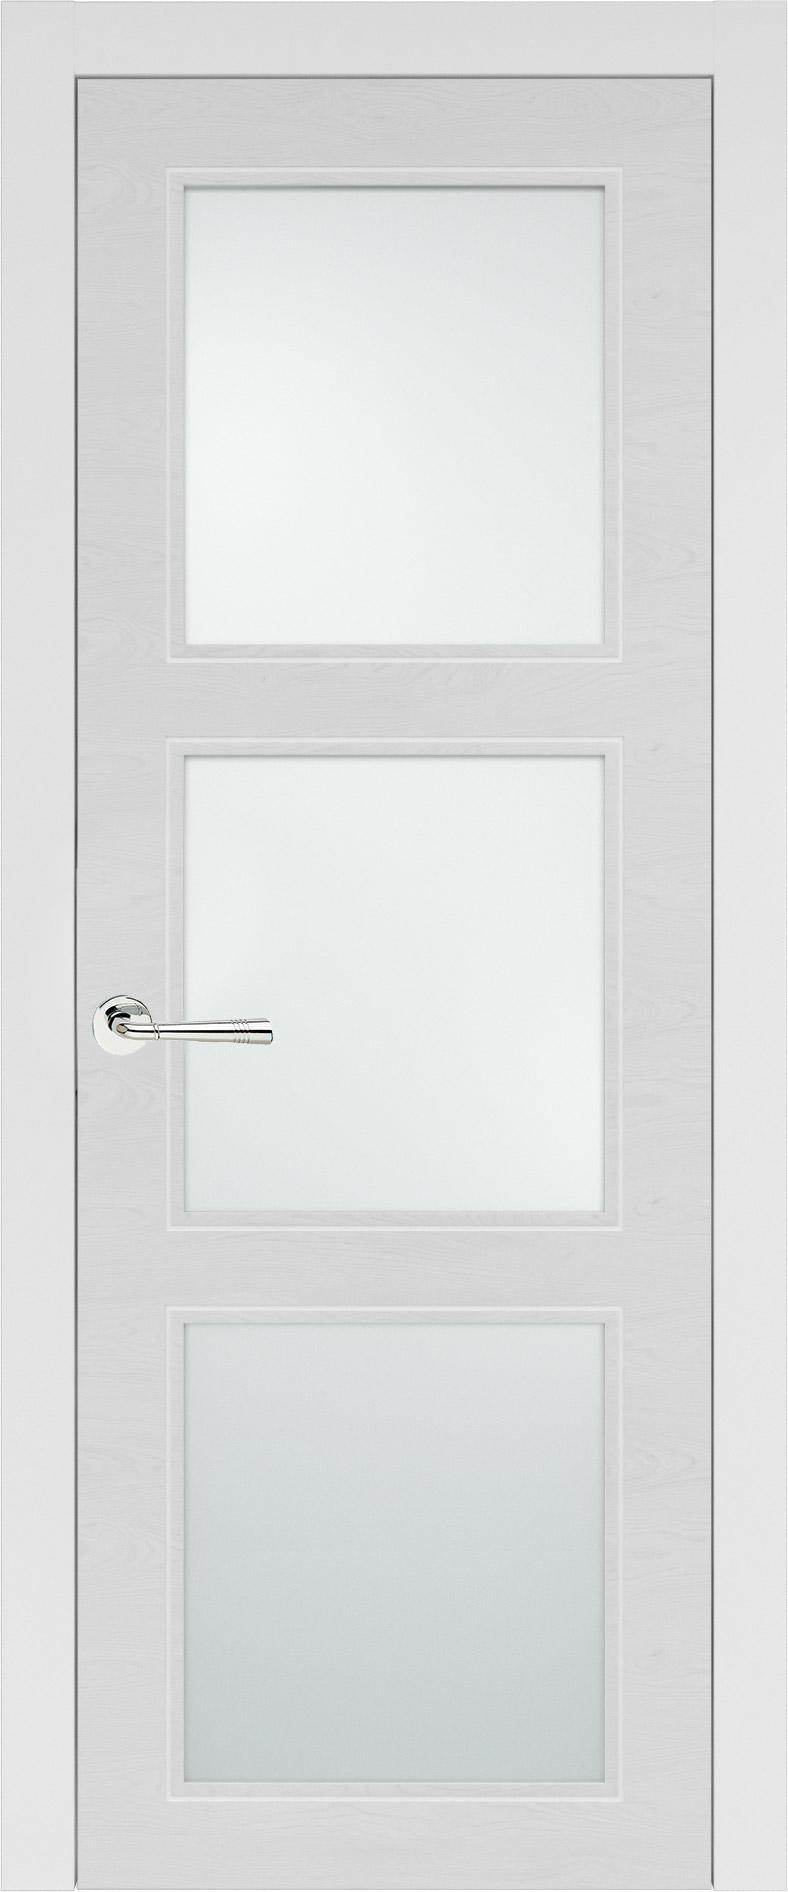 Milano Neo Classic цвет - Белая эмаль по шпону (RAL 9003) Со стеклом (ДО)